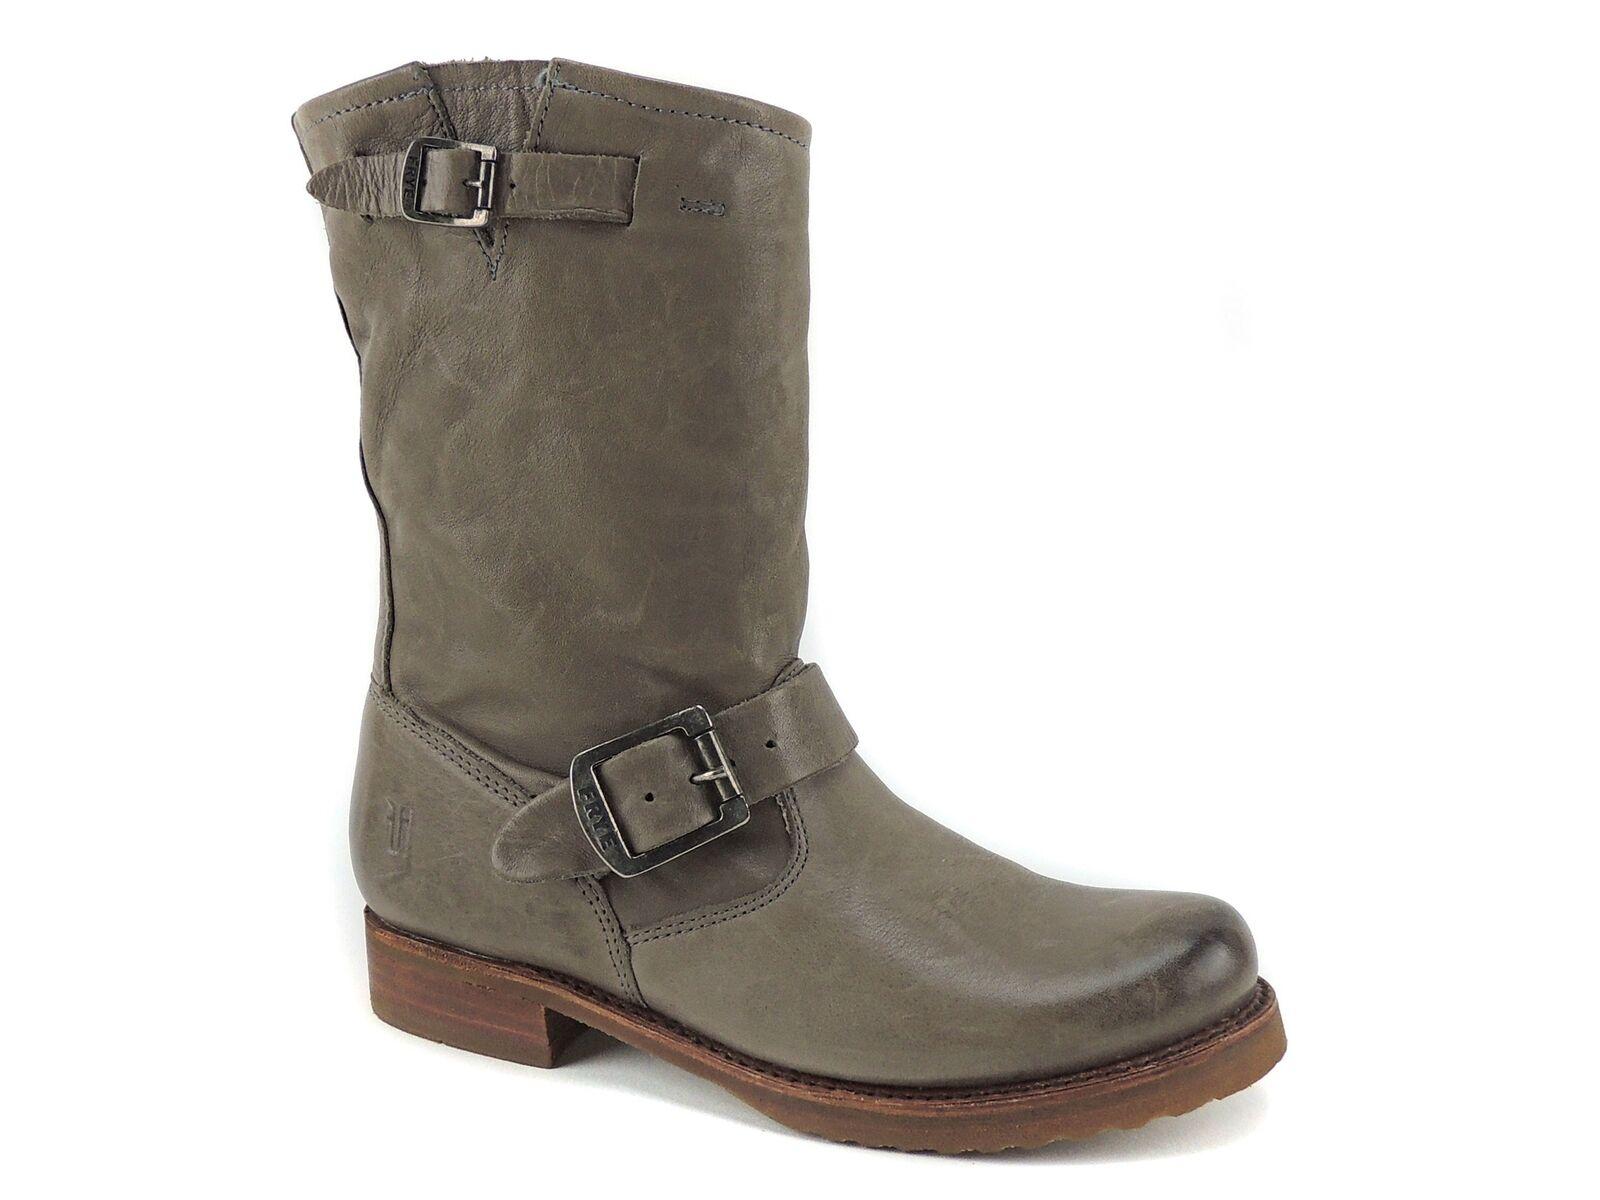 Frye Women's Veronica Shortie-Shaft Boots Grey Vintage Leather Size 5.5 M